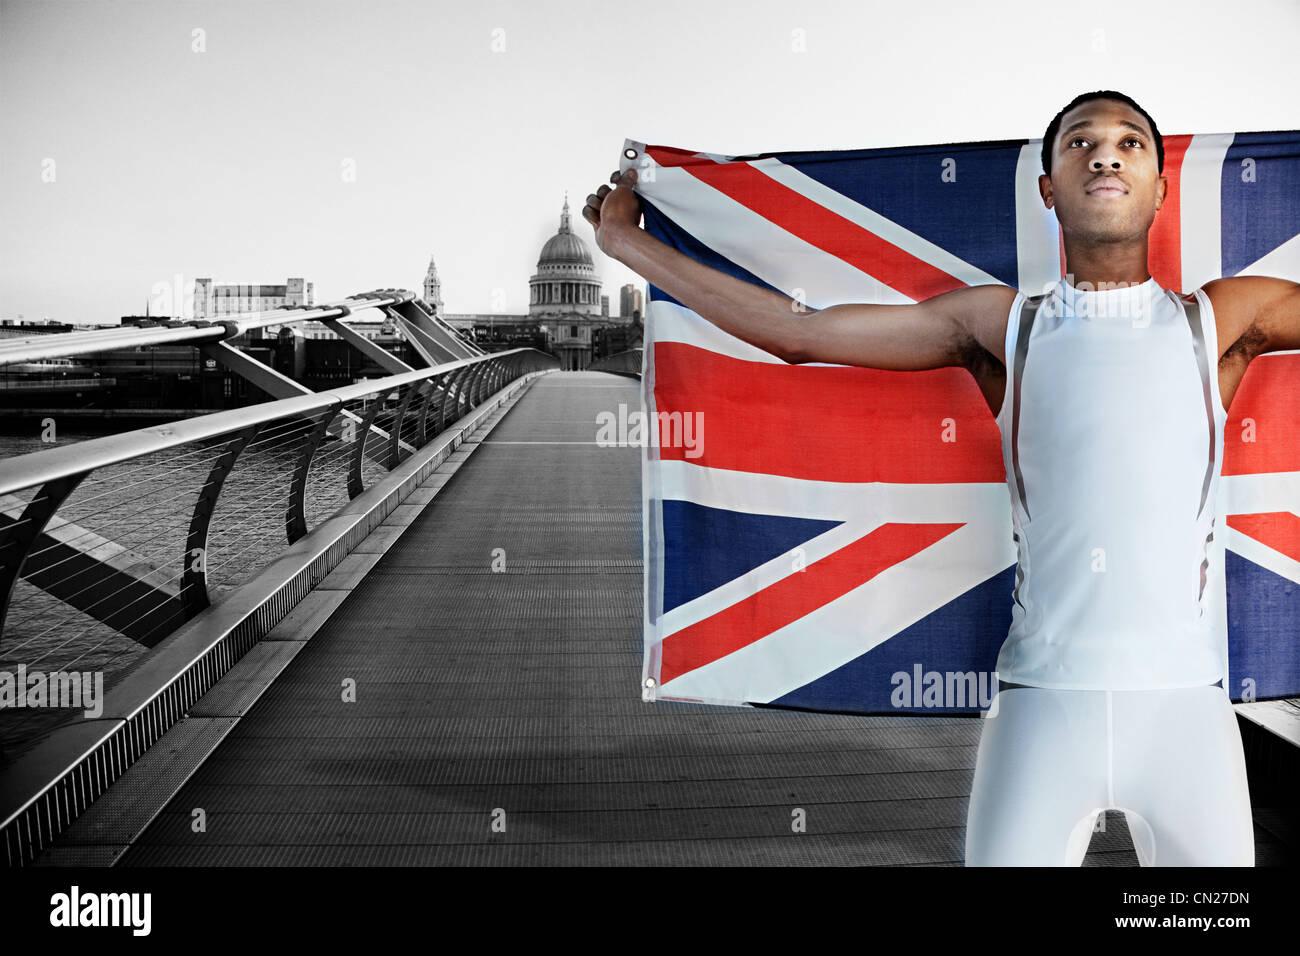 Olympic competitor on Millennium Bridge, London, England - Stock Image